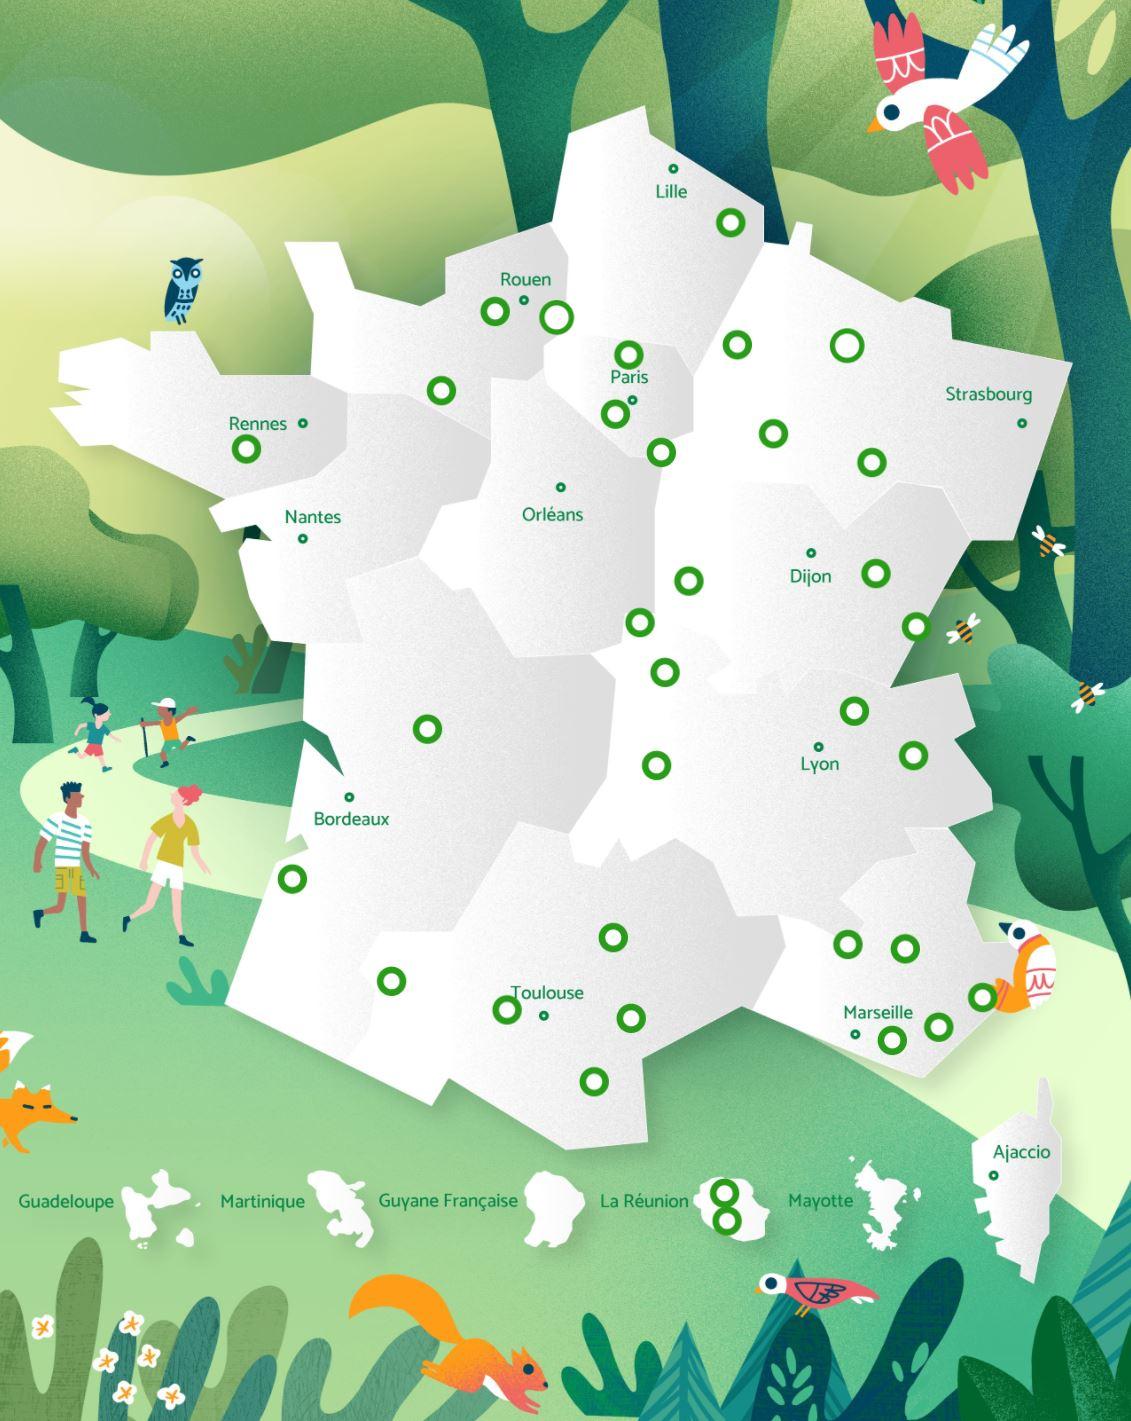 Office national des forêts ONF Carte Intéractive recherche arpenter France